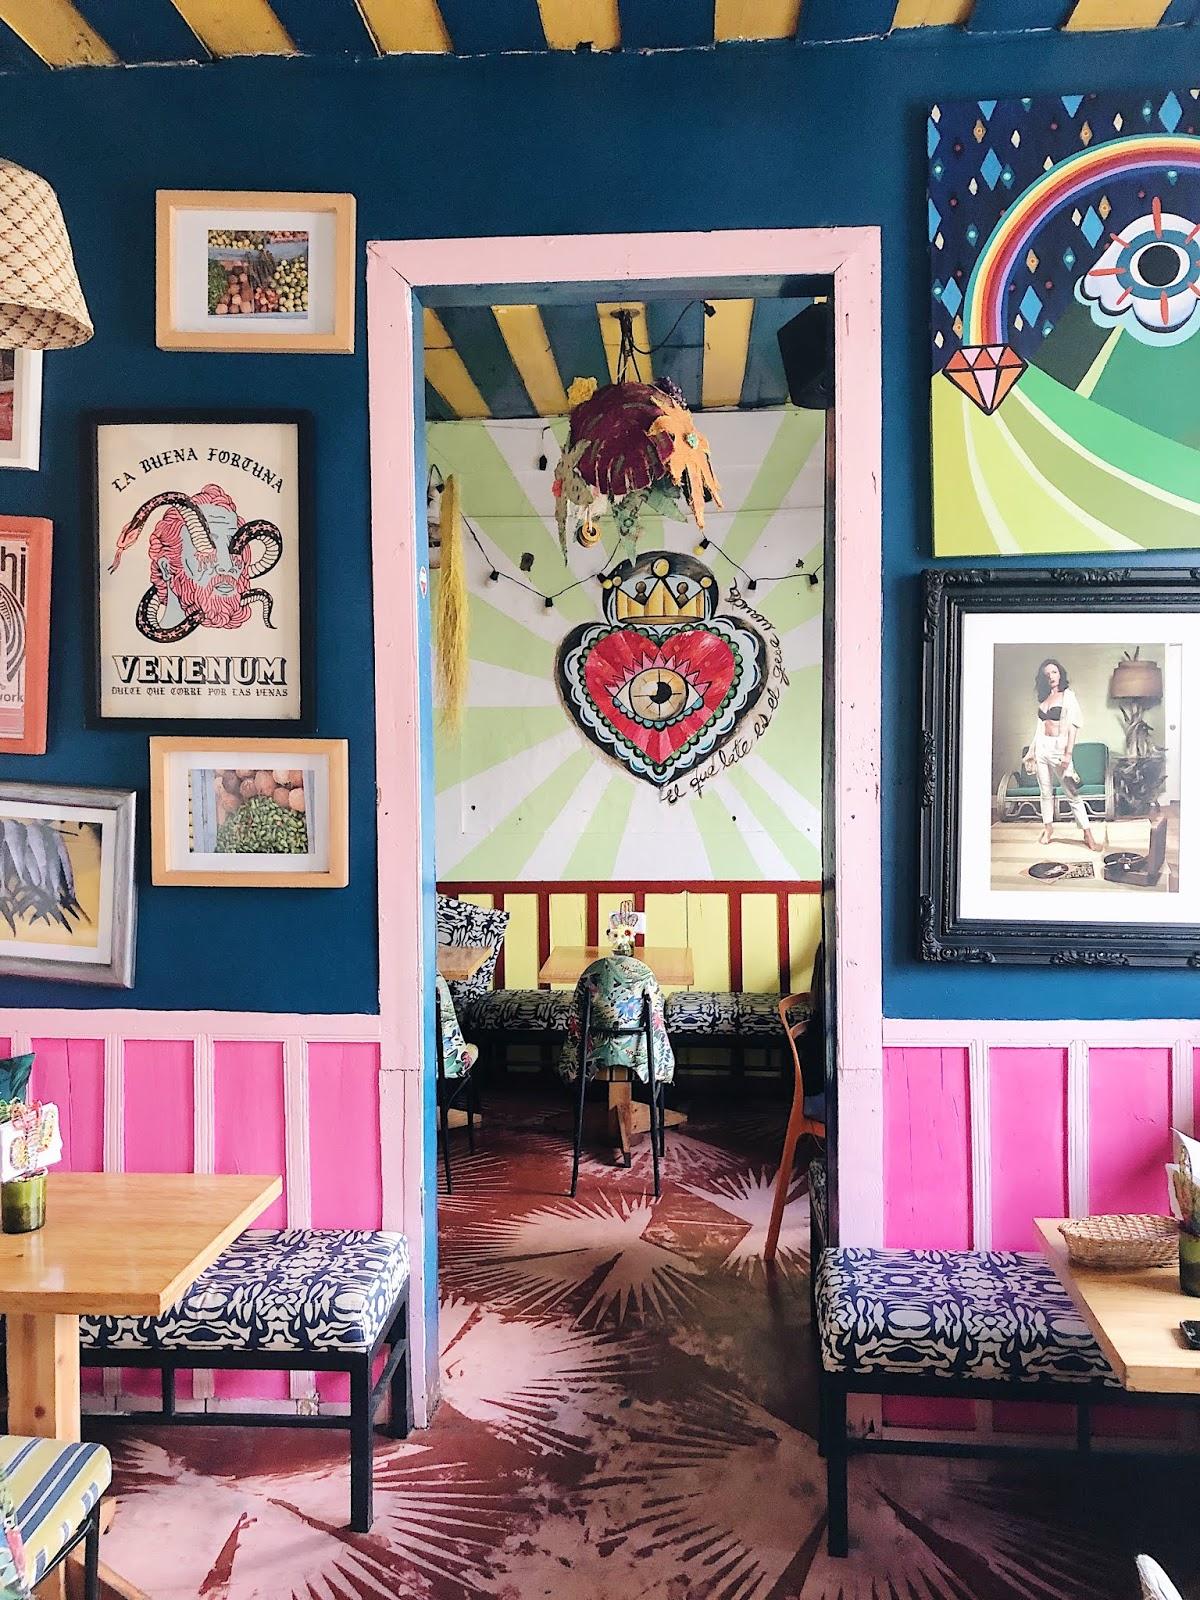 Filandia Colombia, helena adentro colombia , helena adentro filandia , helena adentro restaurant